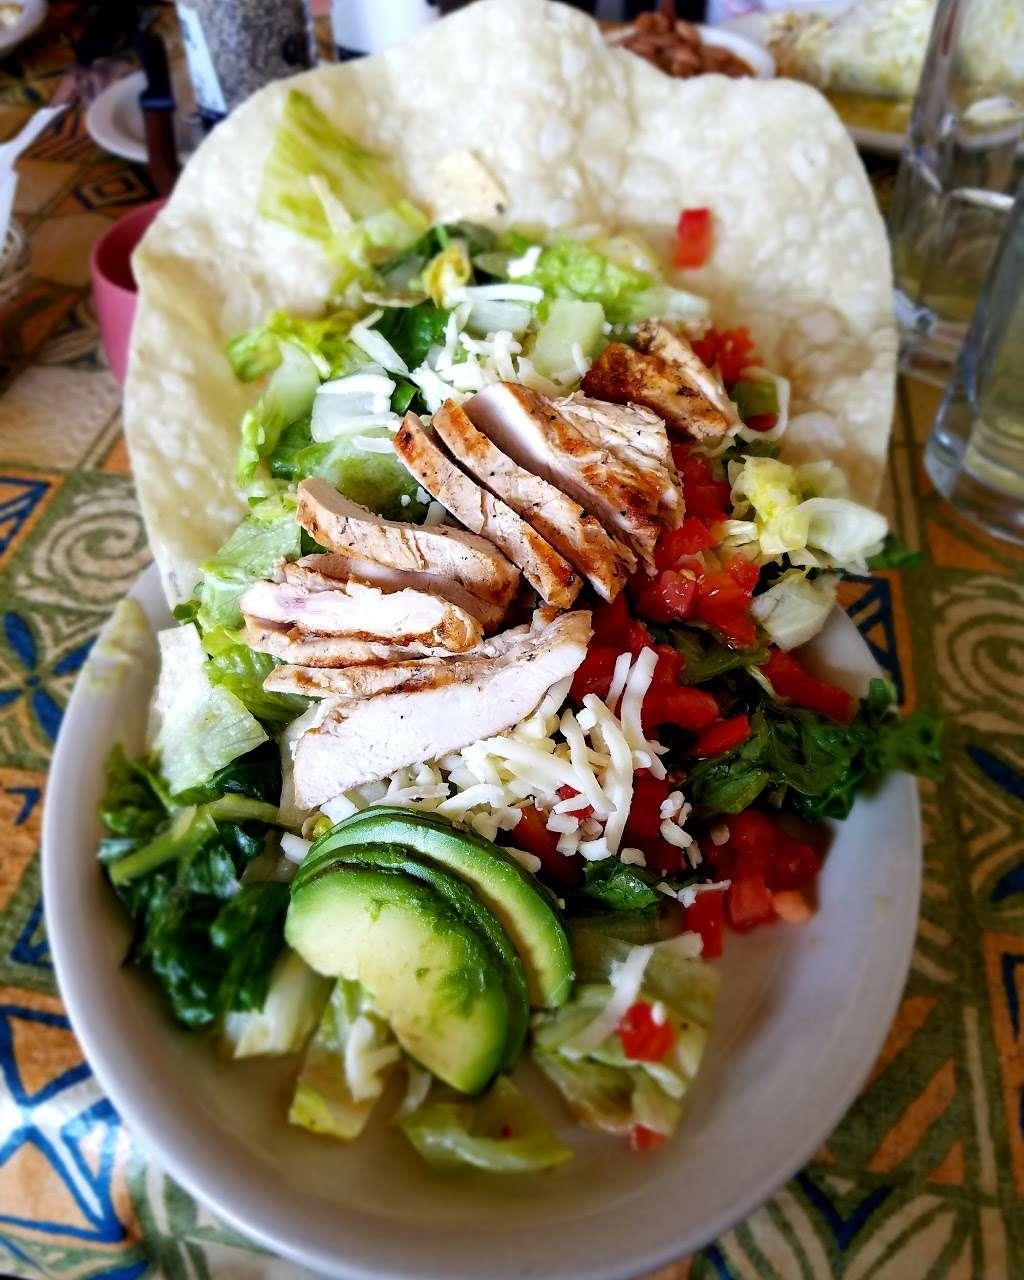 Anchos Southwest Grill & Bar - restaurant  | Photo 7 of 10 | Address: 10773 Hole Ave, Riverside, CA 92505, USA | Phone: (951) 352-0240